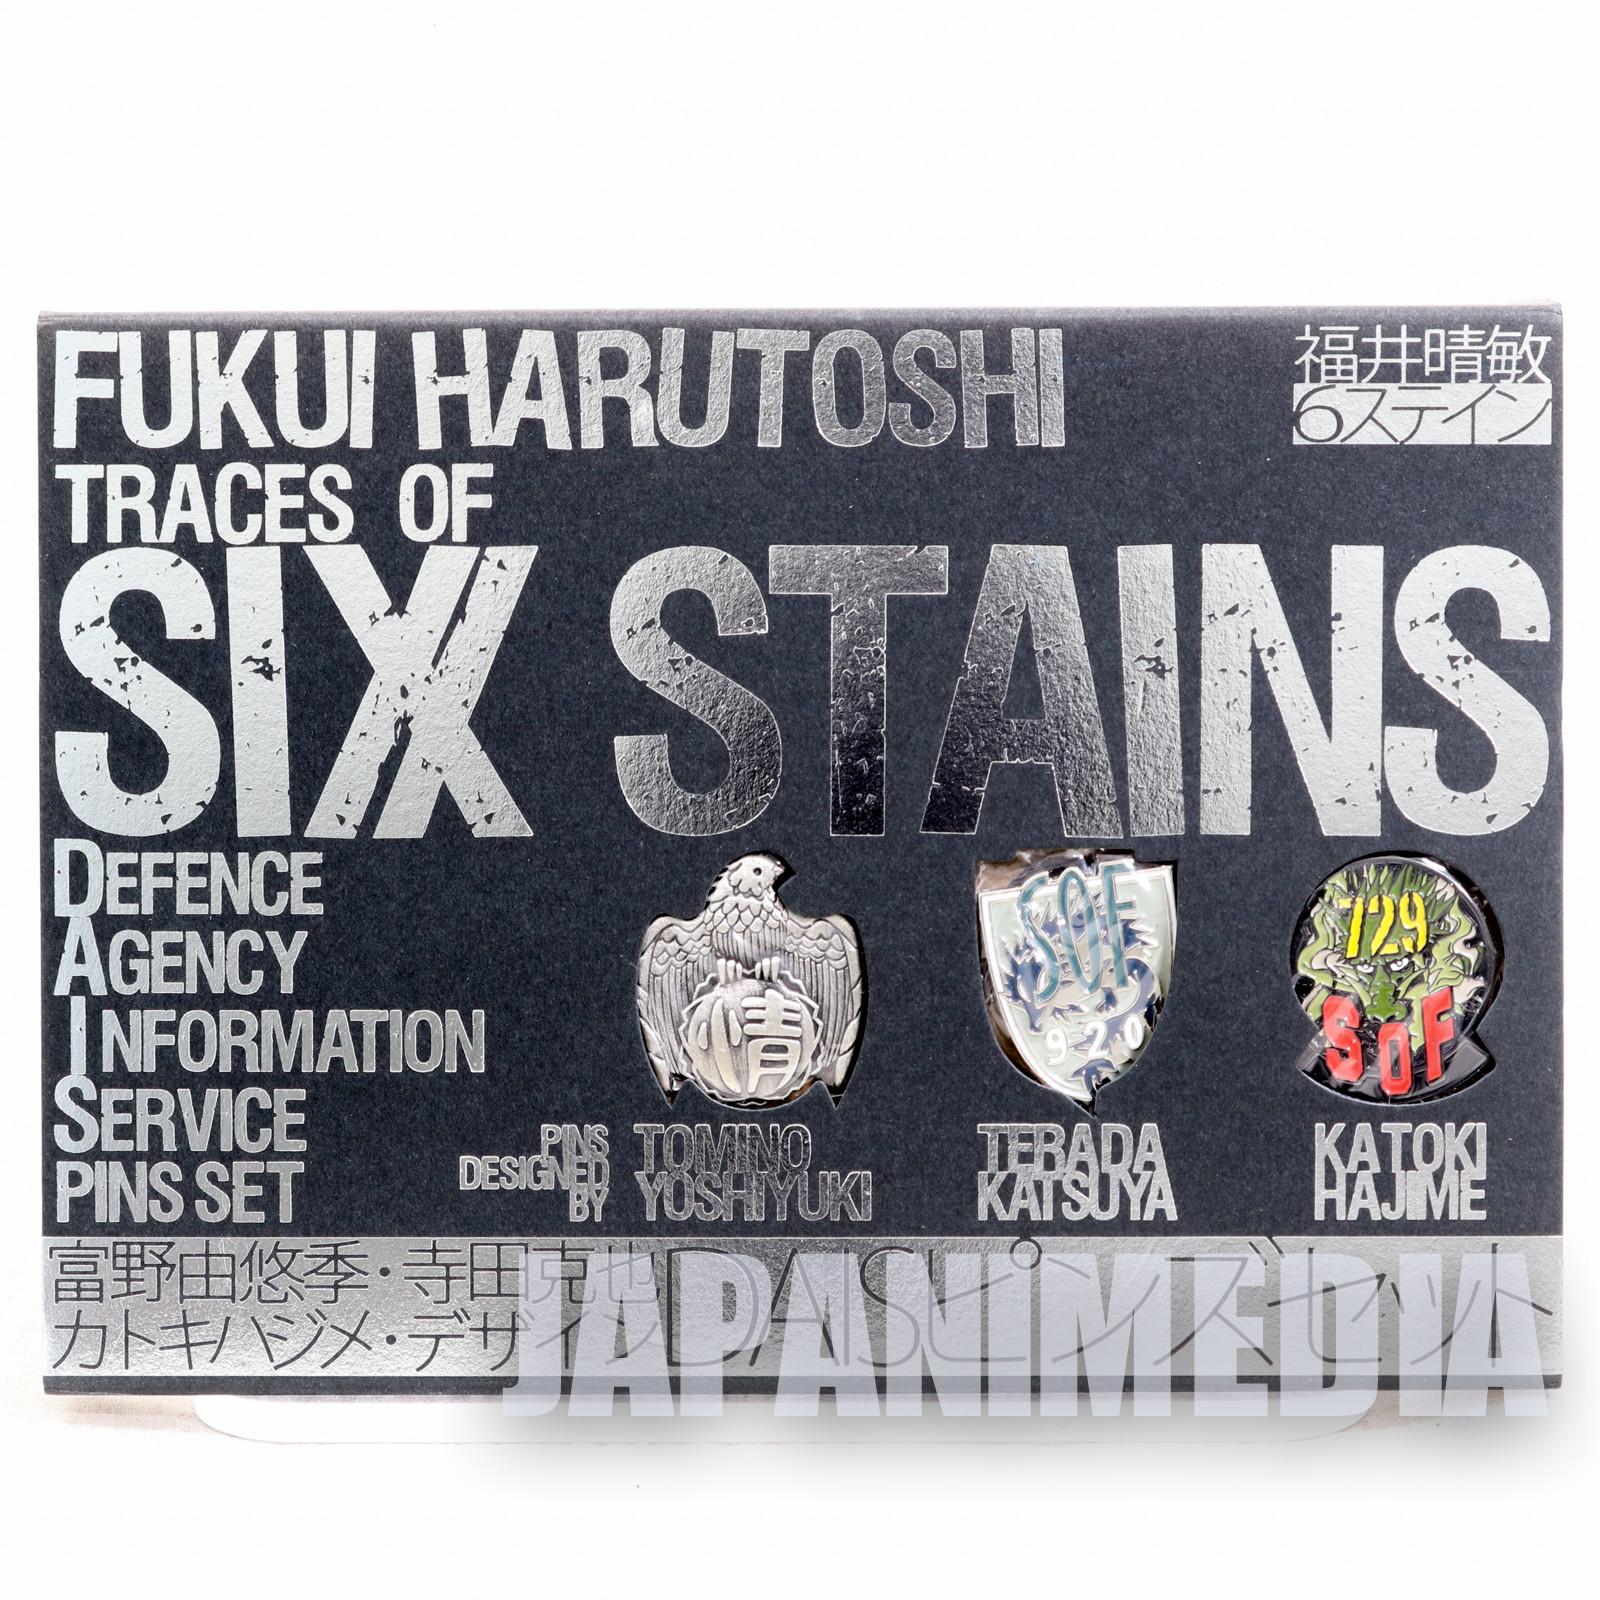 Trace of Six Stains DAIS Pins 3pc Set Yoshiyuki Tomino Katsuya Terada